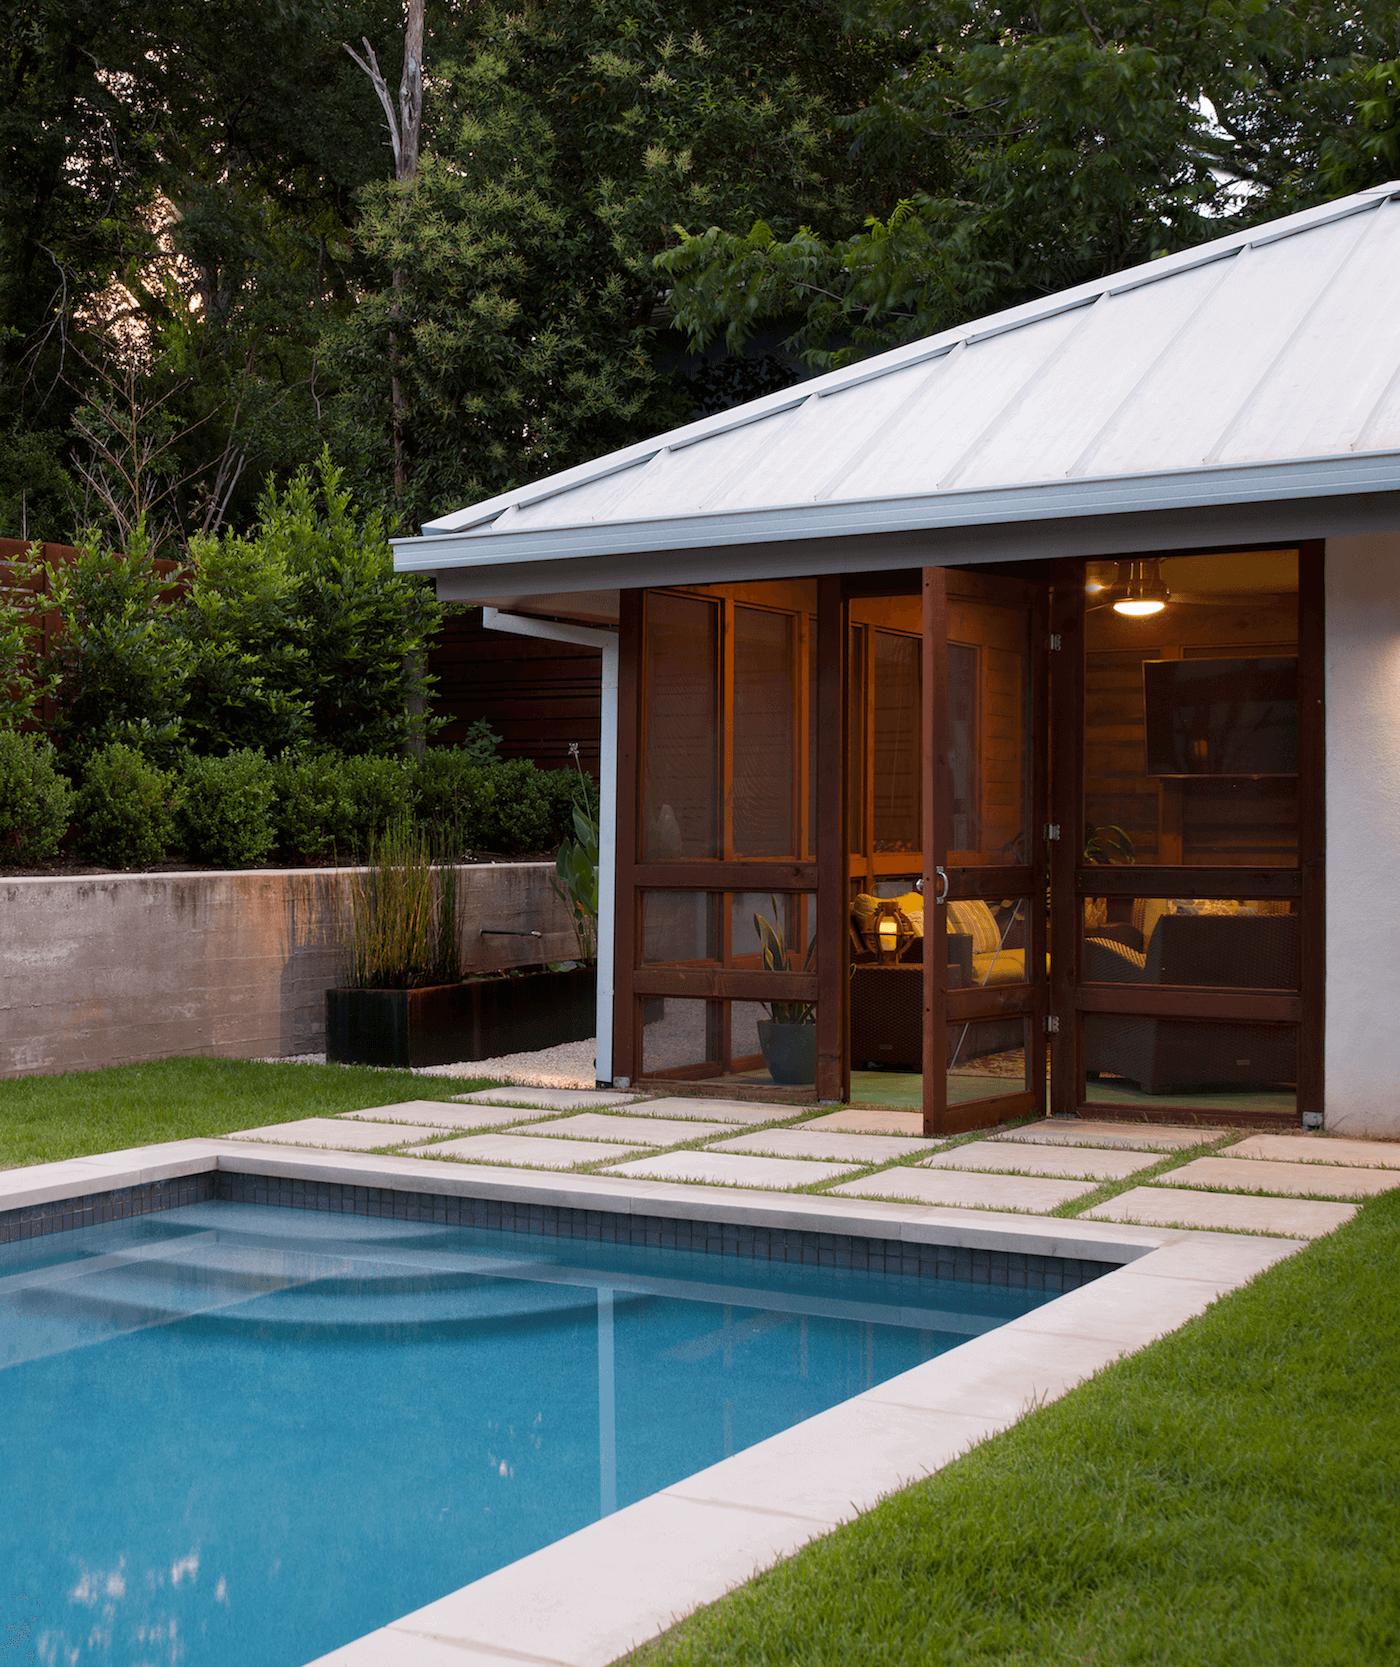 Tarrytown Exterior Screened Porch and Pool | Robin Colton Interior Design Studio Austin Texas | www.robincolton.com